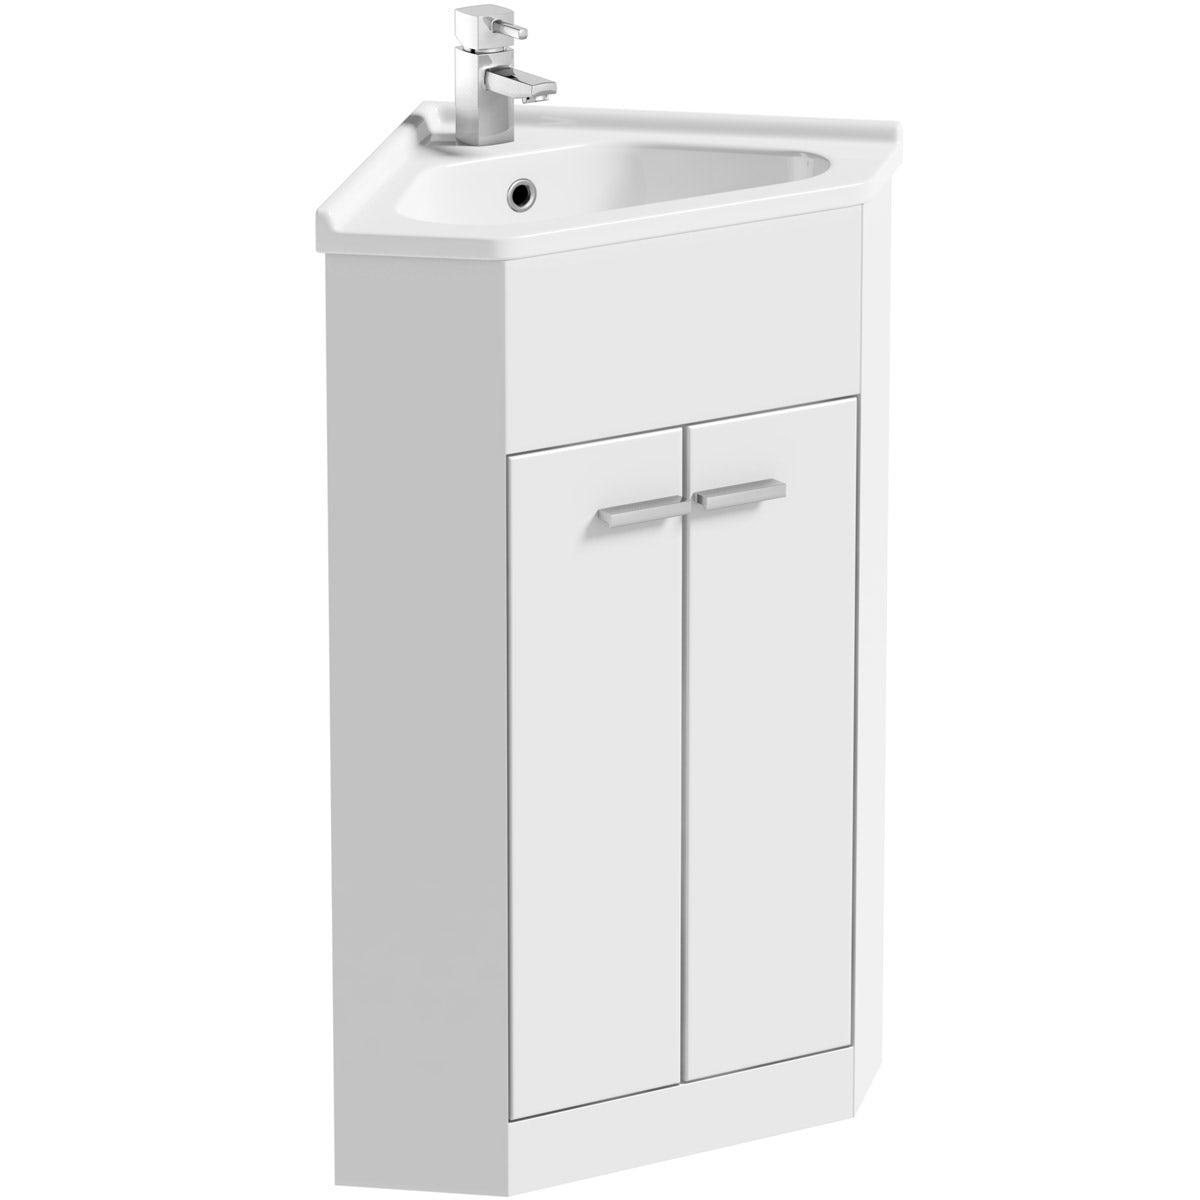 Clarity Compact White Corner Floorstanding Vanity Unit And